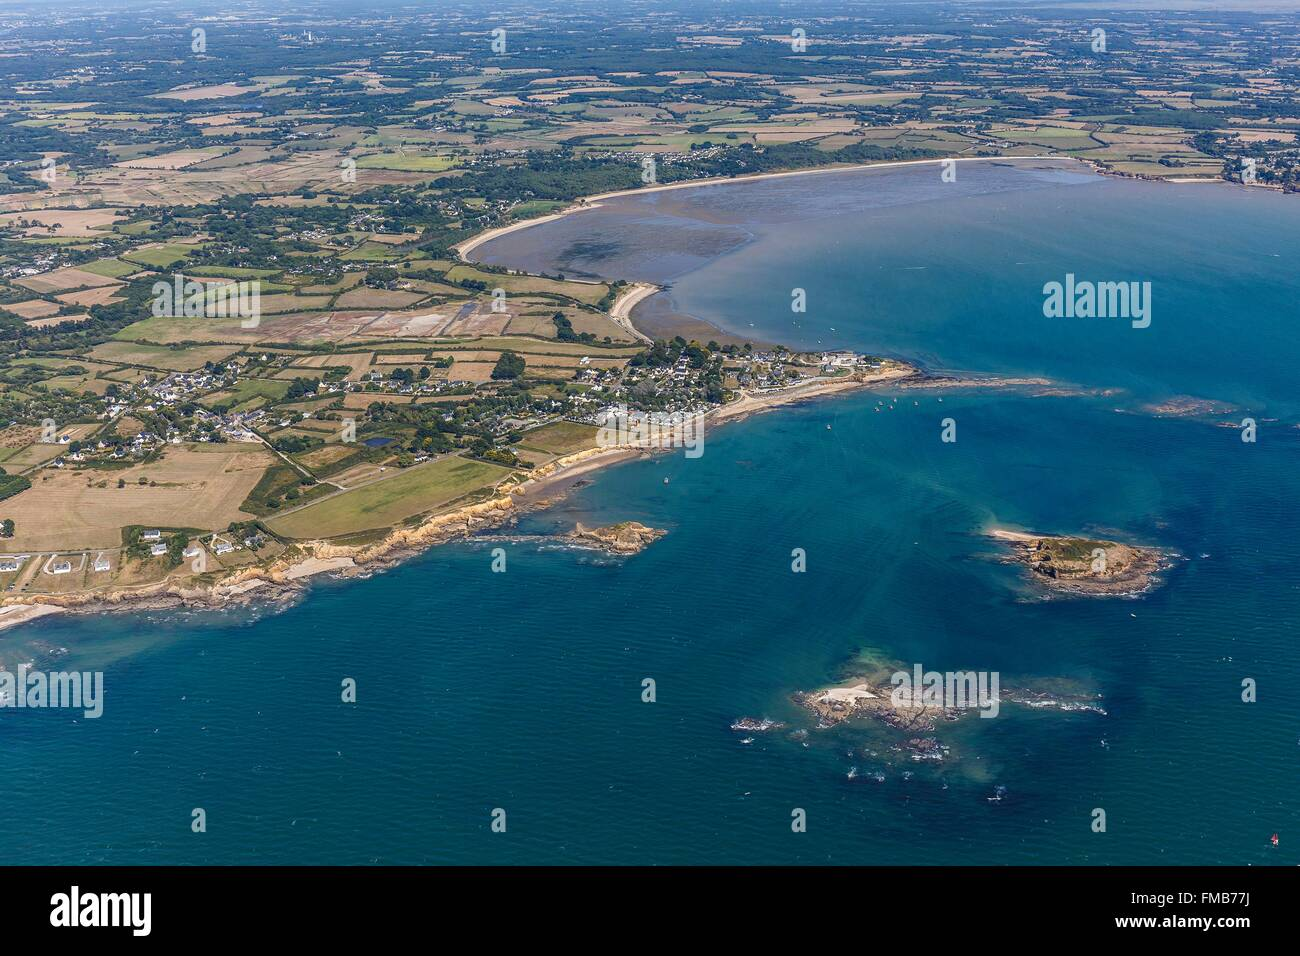 France, Morbihan, Penestin, Bacchus island, pointe du Bile and Pont Mahe bay (aerial view) - Stock Image